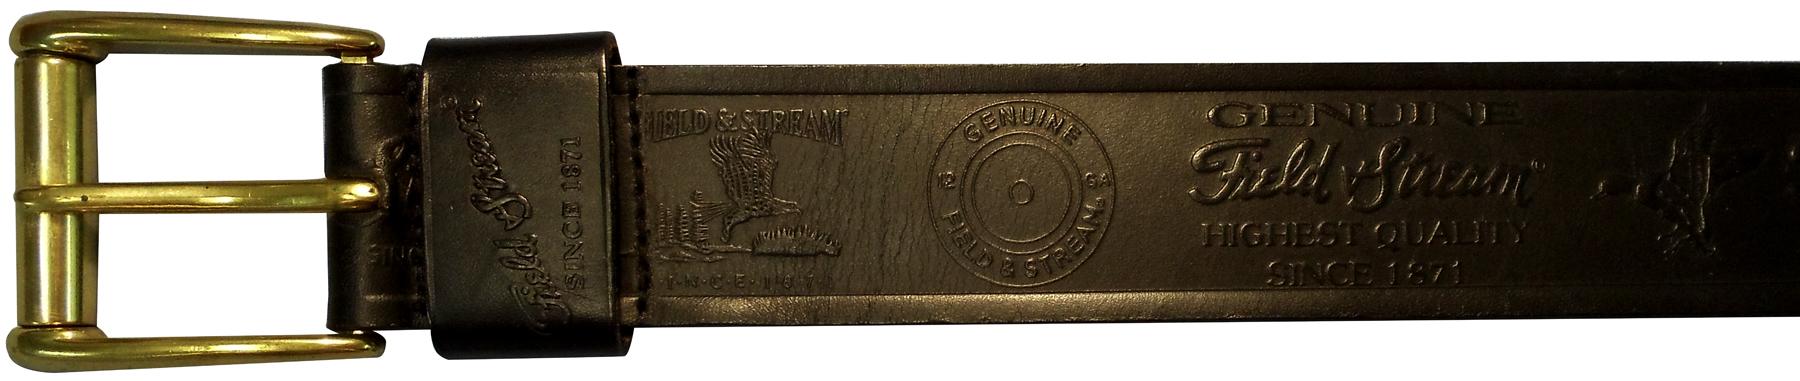 "10610300132 - 32"" Black Leather Belt With Logo"